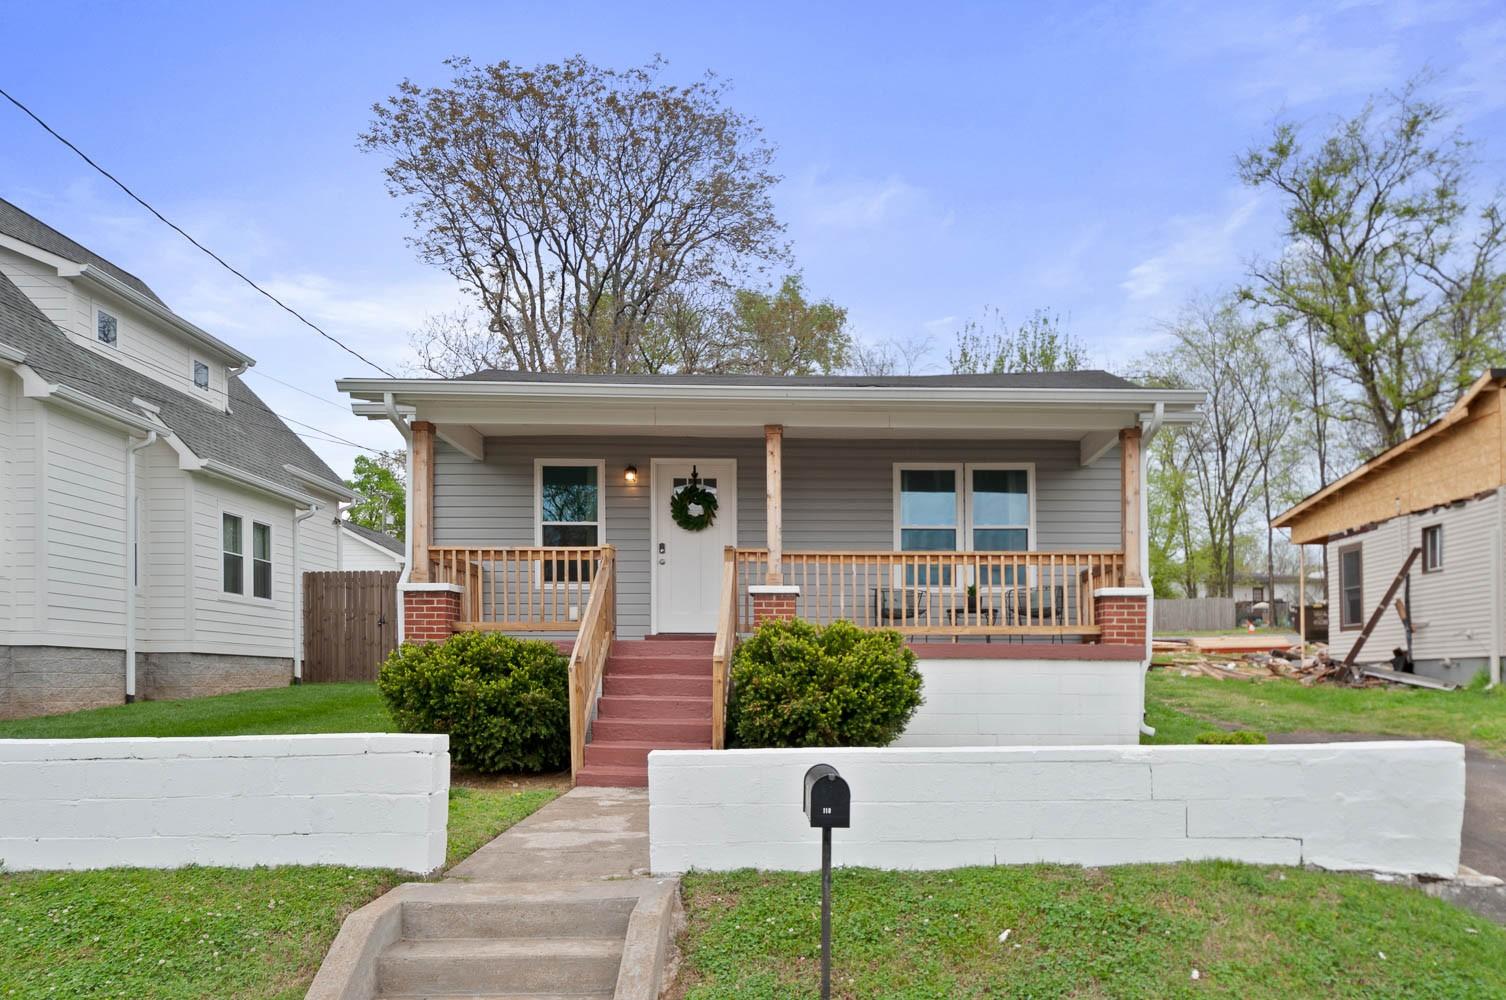 110 Joyner Ave Property Photo - Nashville, TN real estate listing